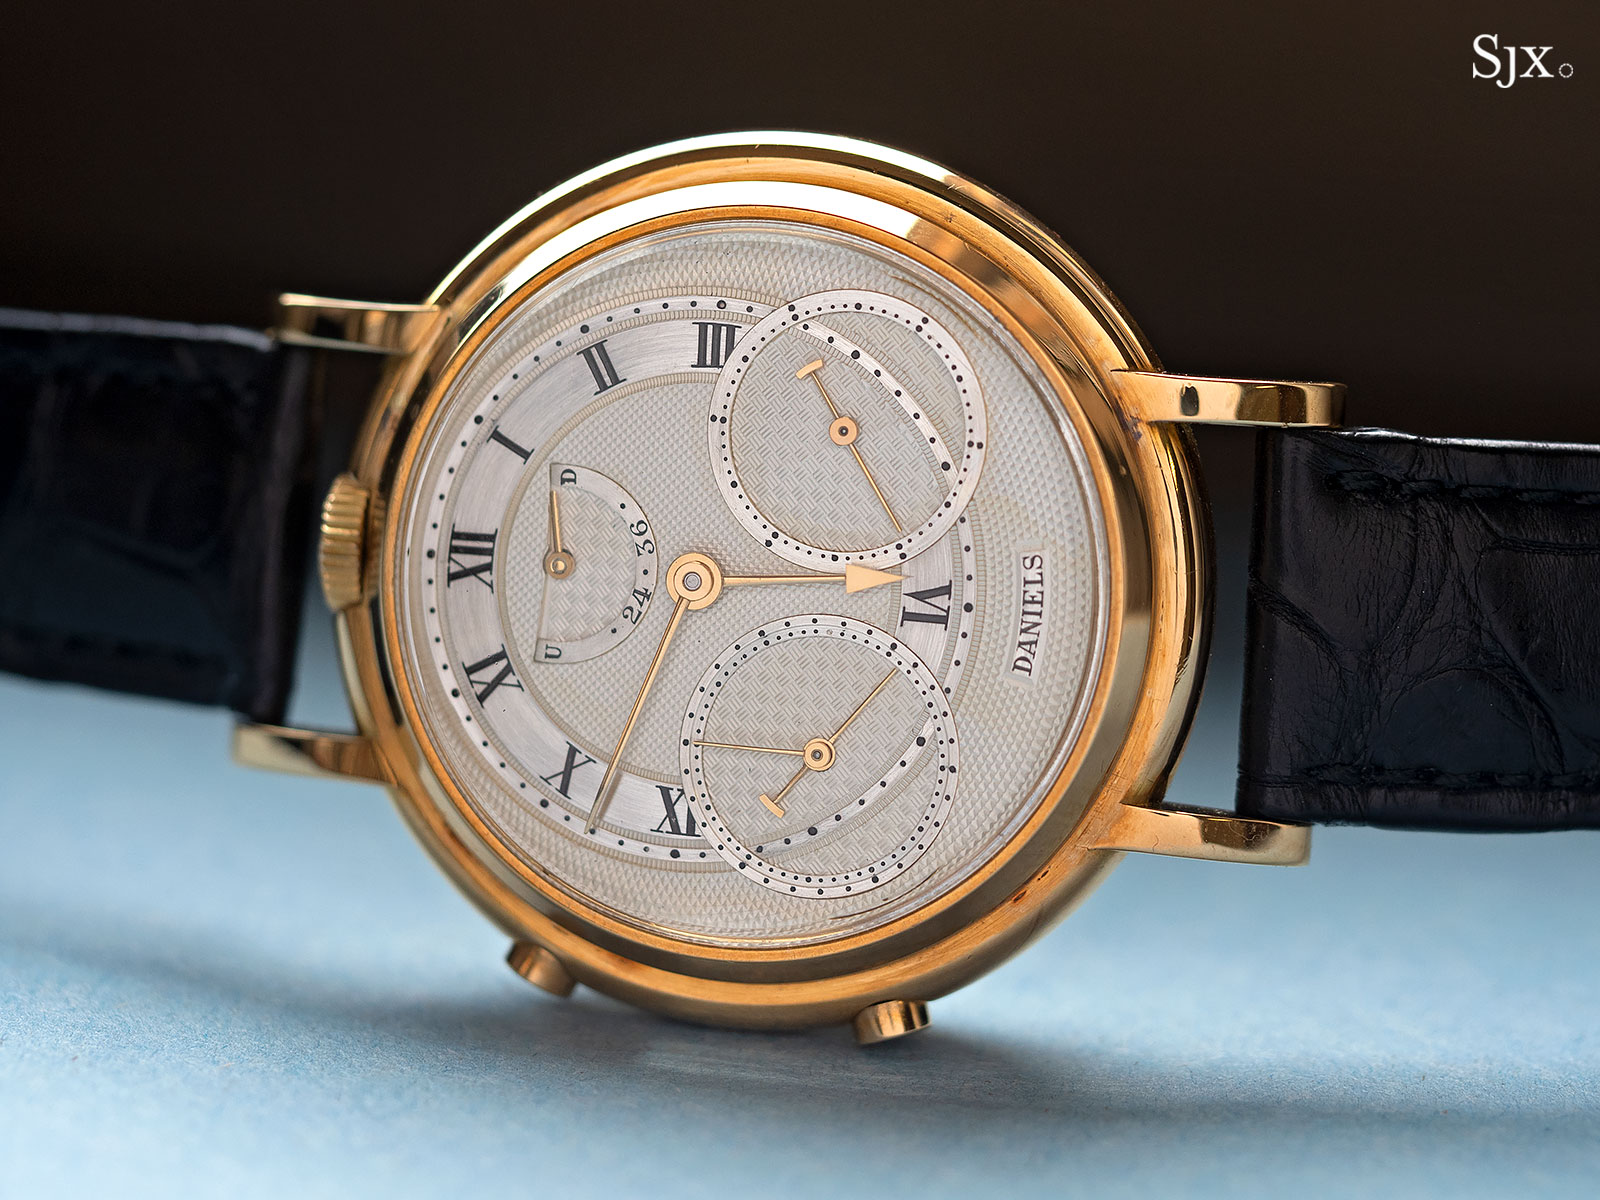 George Daniels Chronograph Wristwatch with tourbillon 9